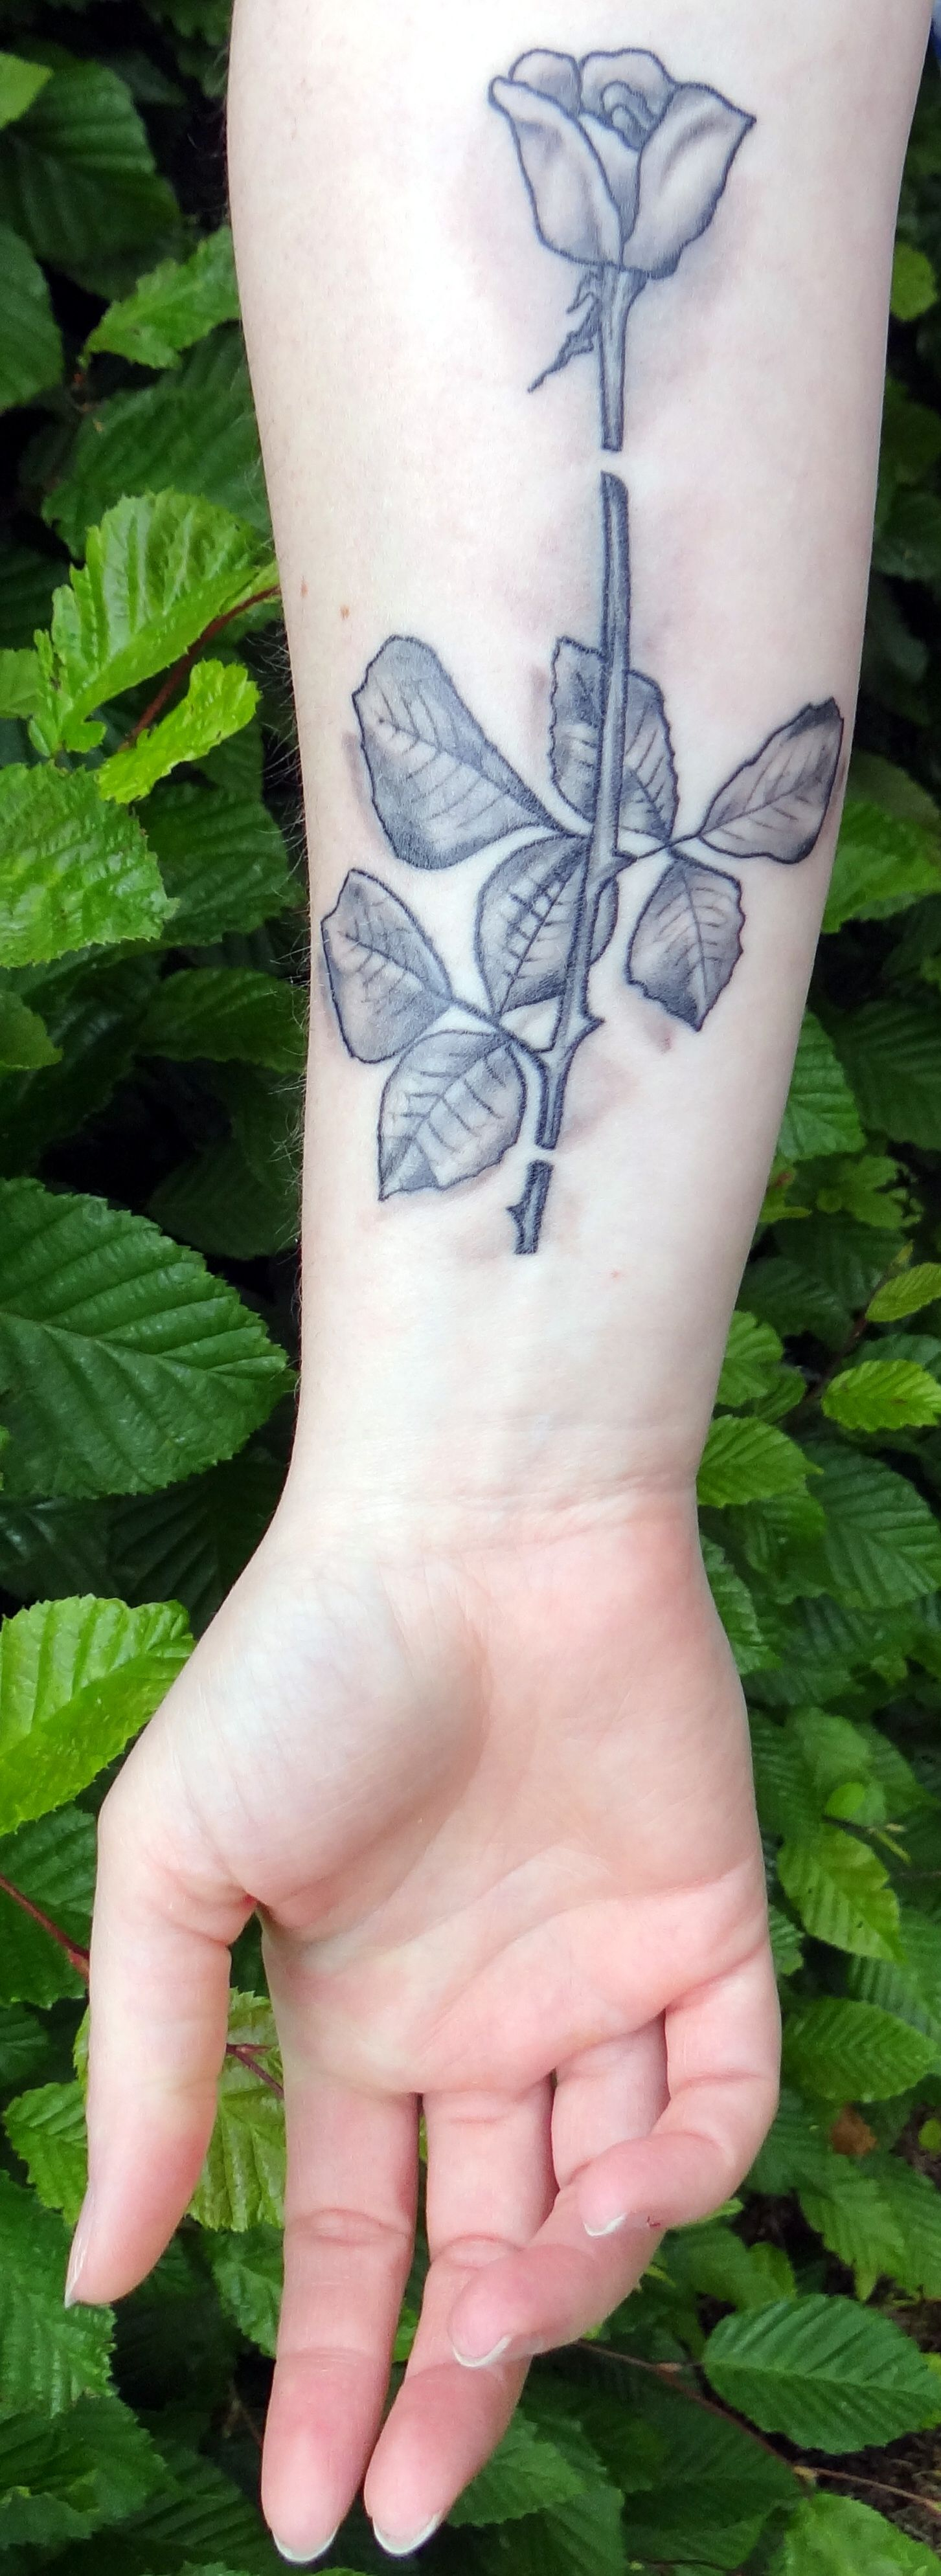 depeche mode violator tattoo - photo #8